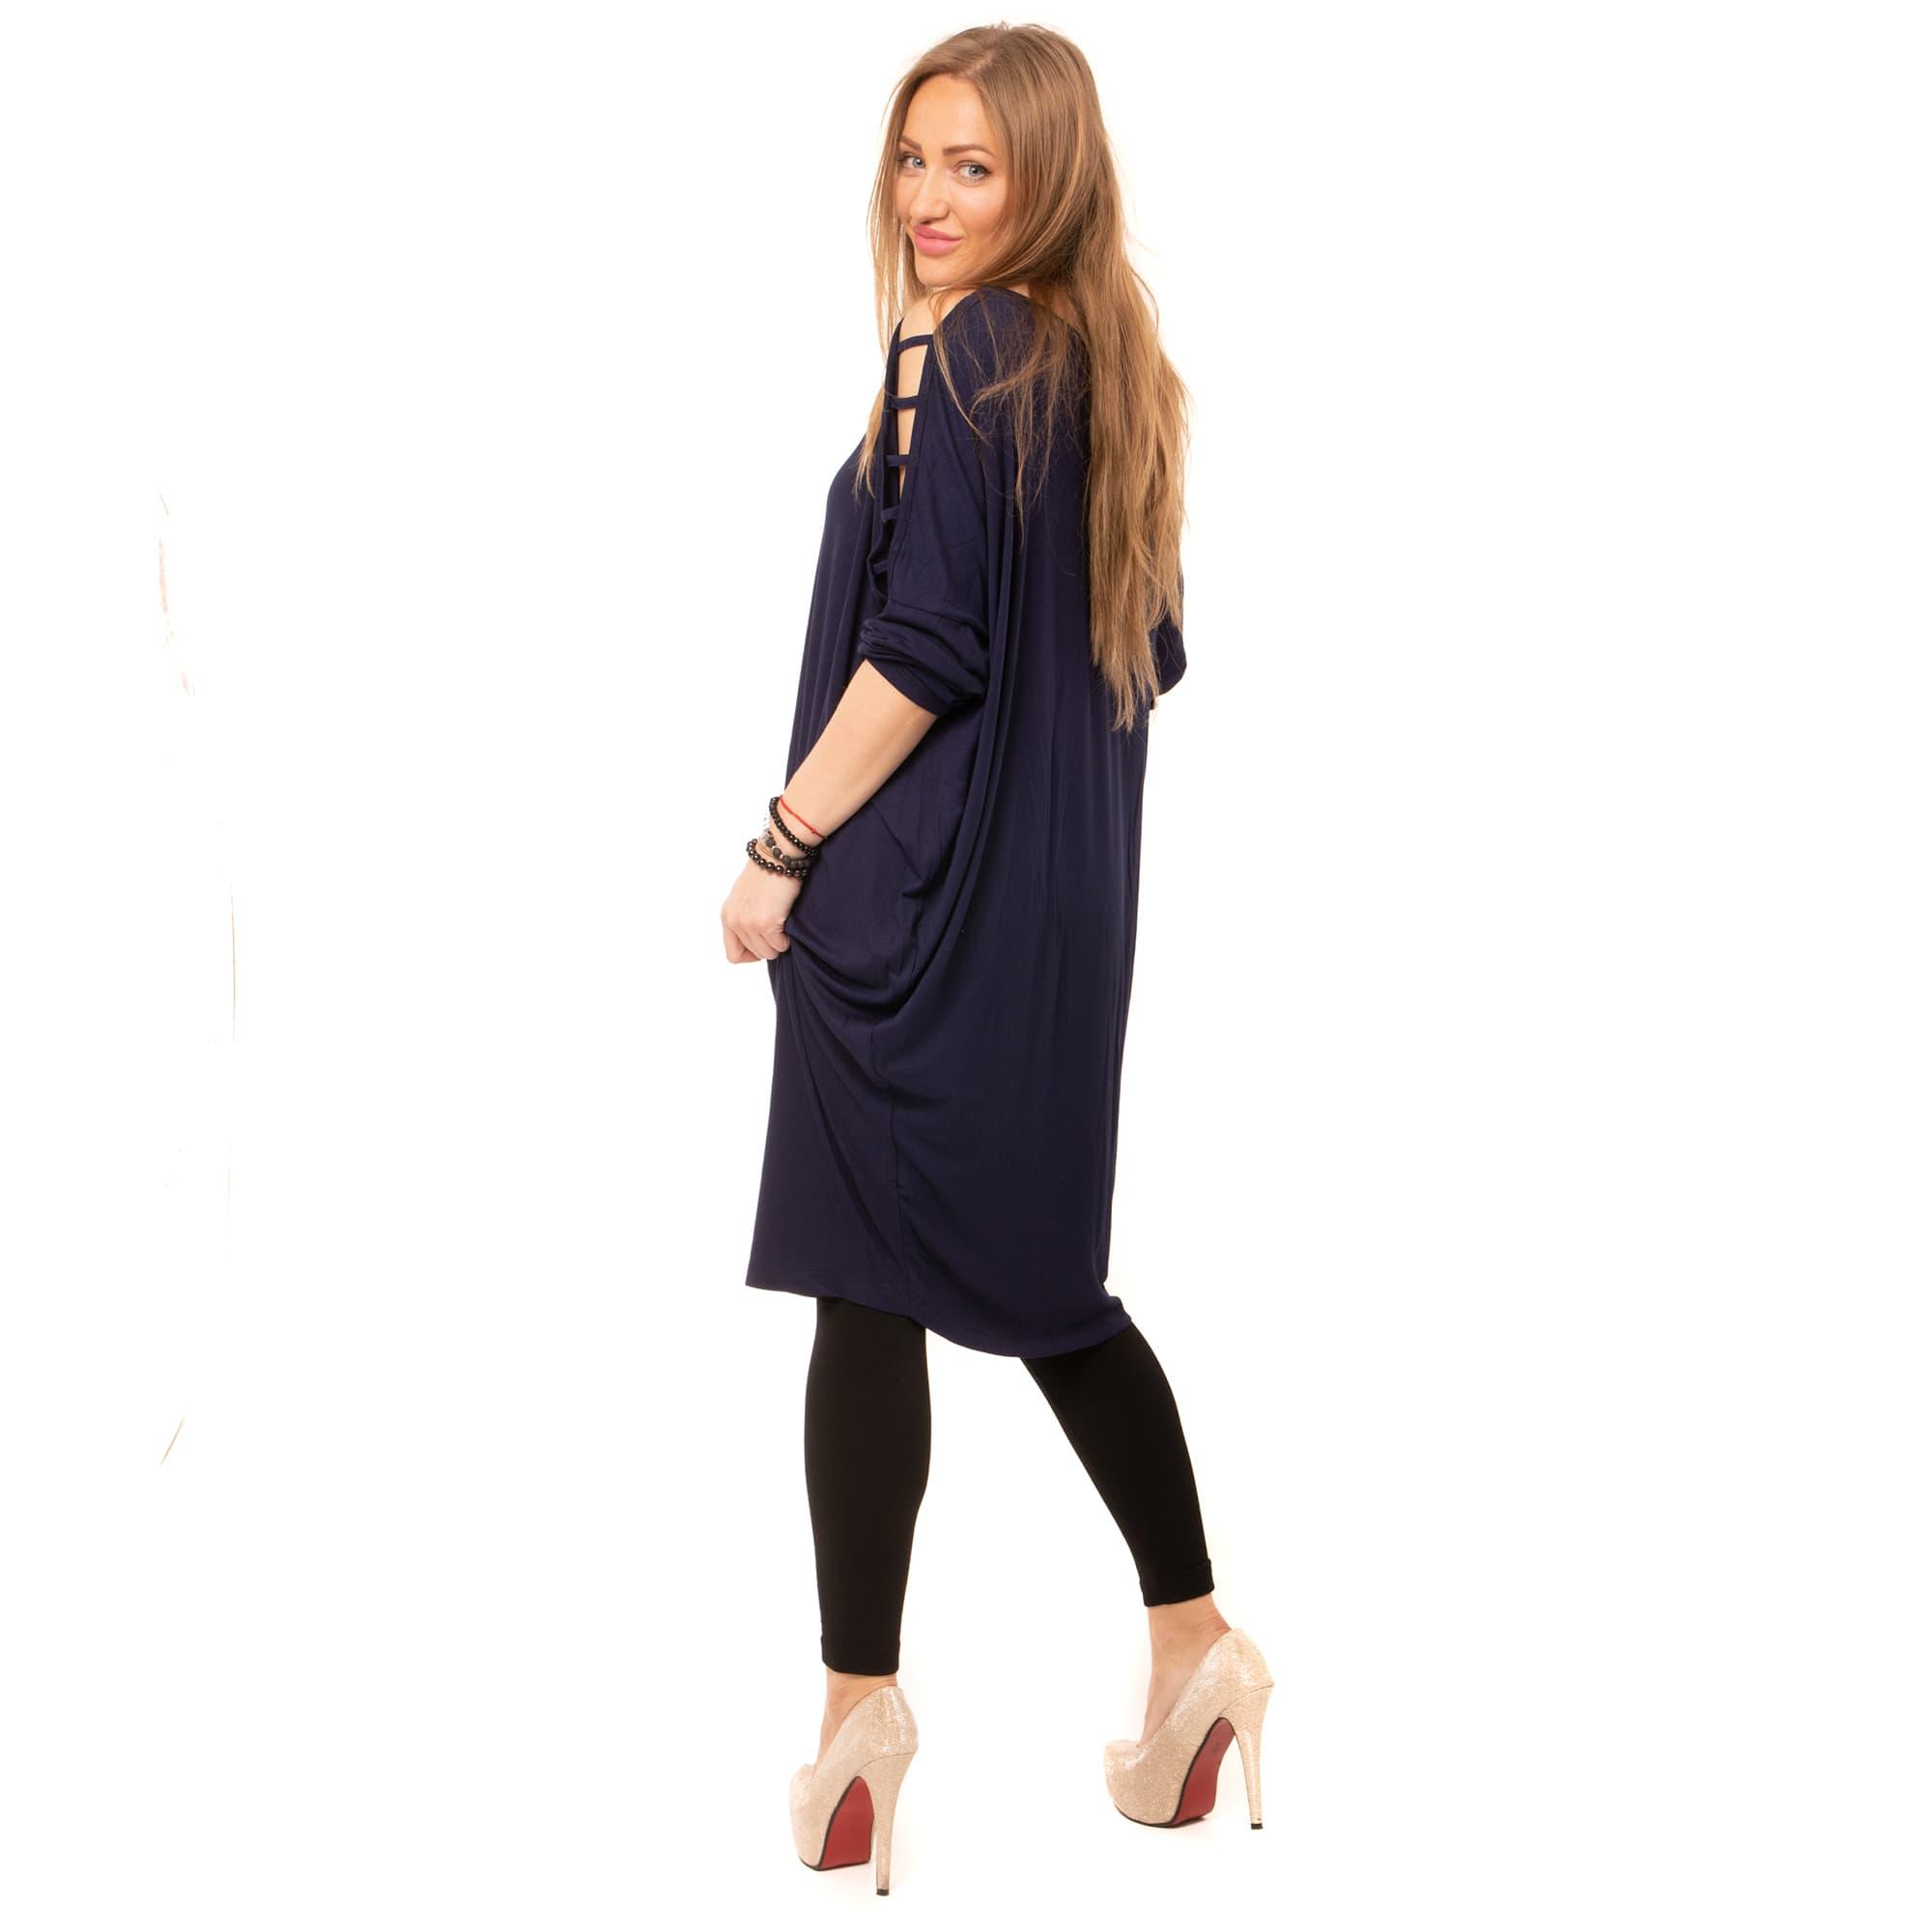 ... Dámska móda a doplnky - Tunika s prestrihmi - modrá ... eef5f26316